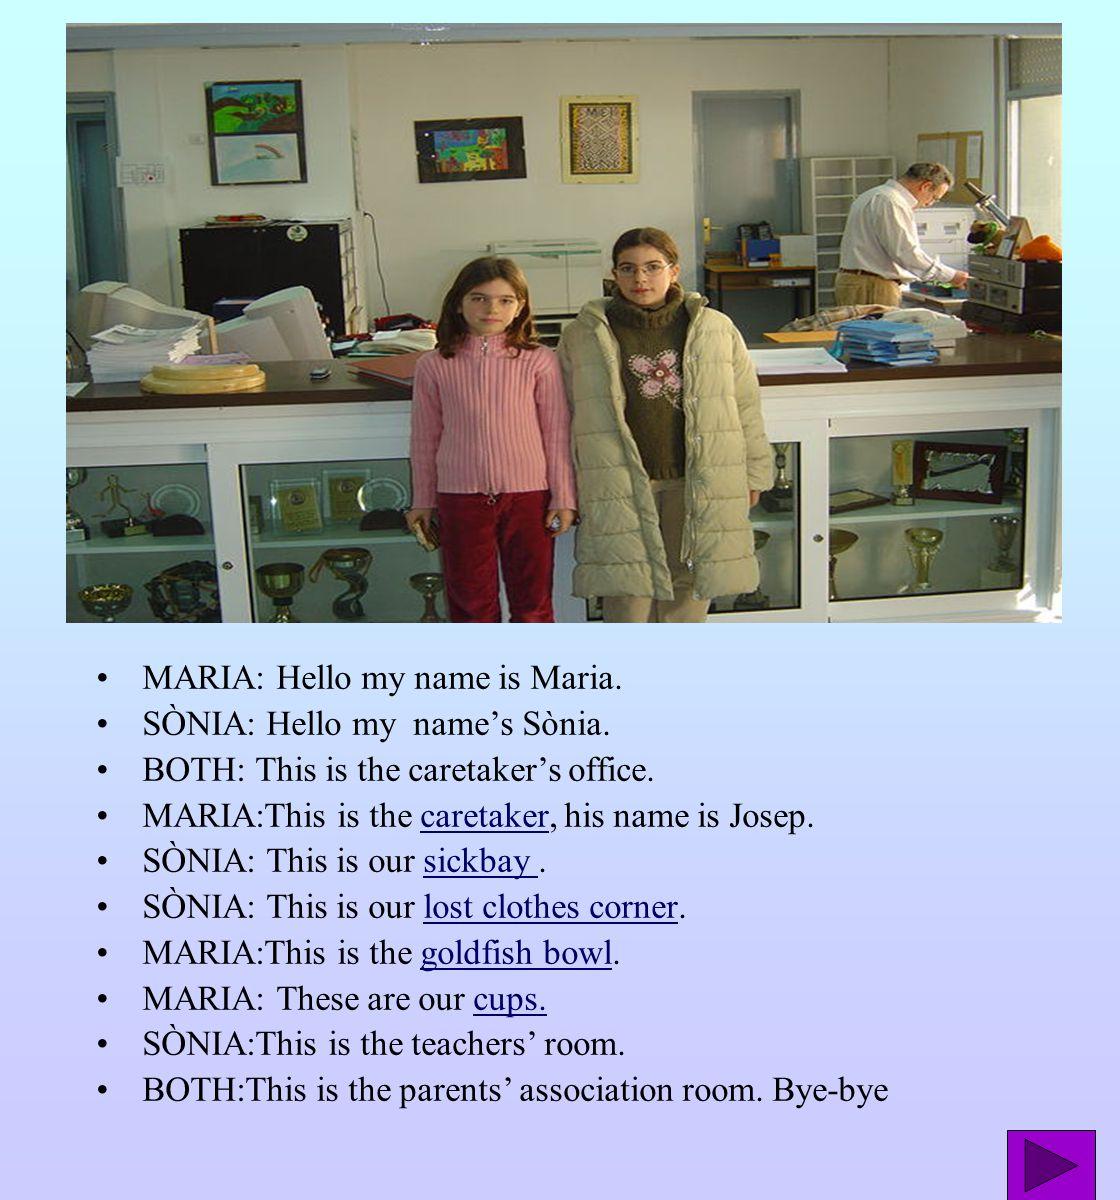 MARIA: Hello my name is Maria. SÒNIA: Hello my name's Sònia. BOTH: This is the caretaker's office. MARIA:This is the caretaker, his name is Josep.care